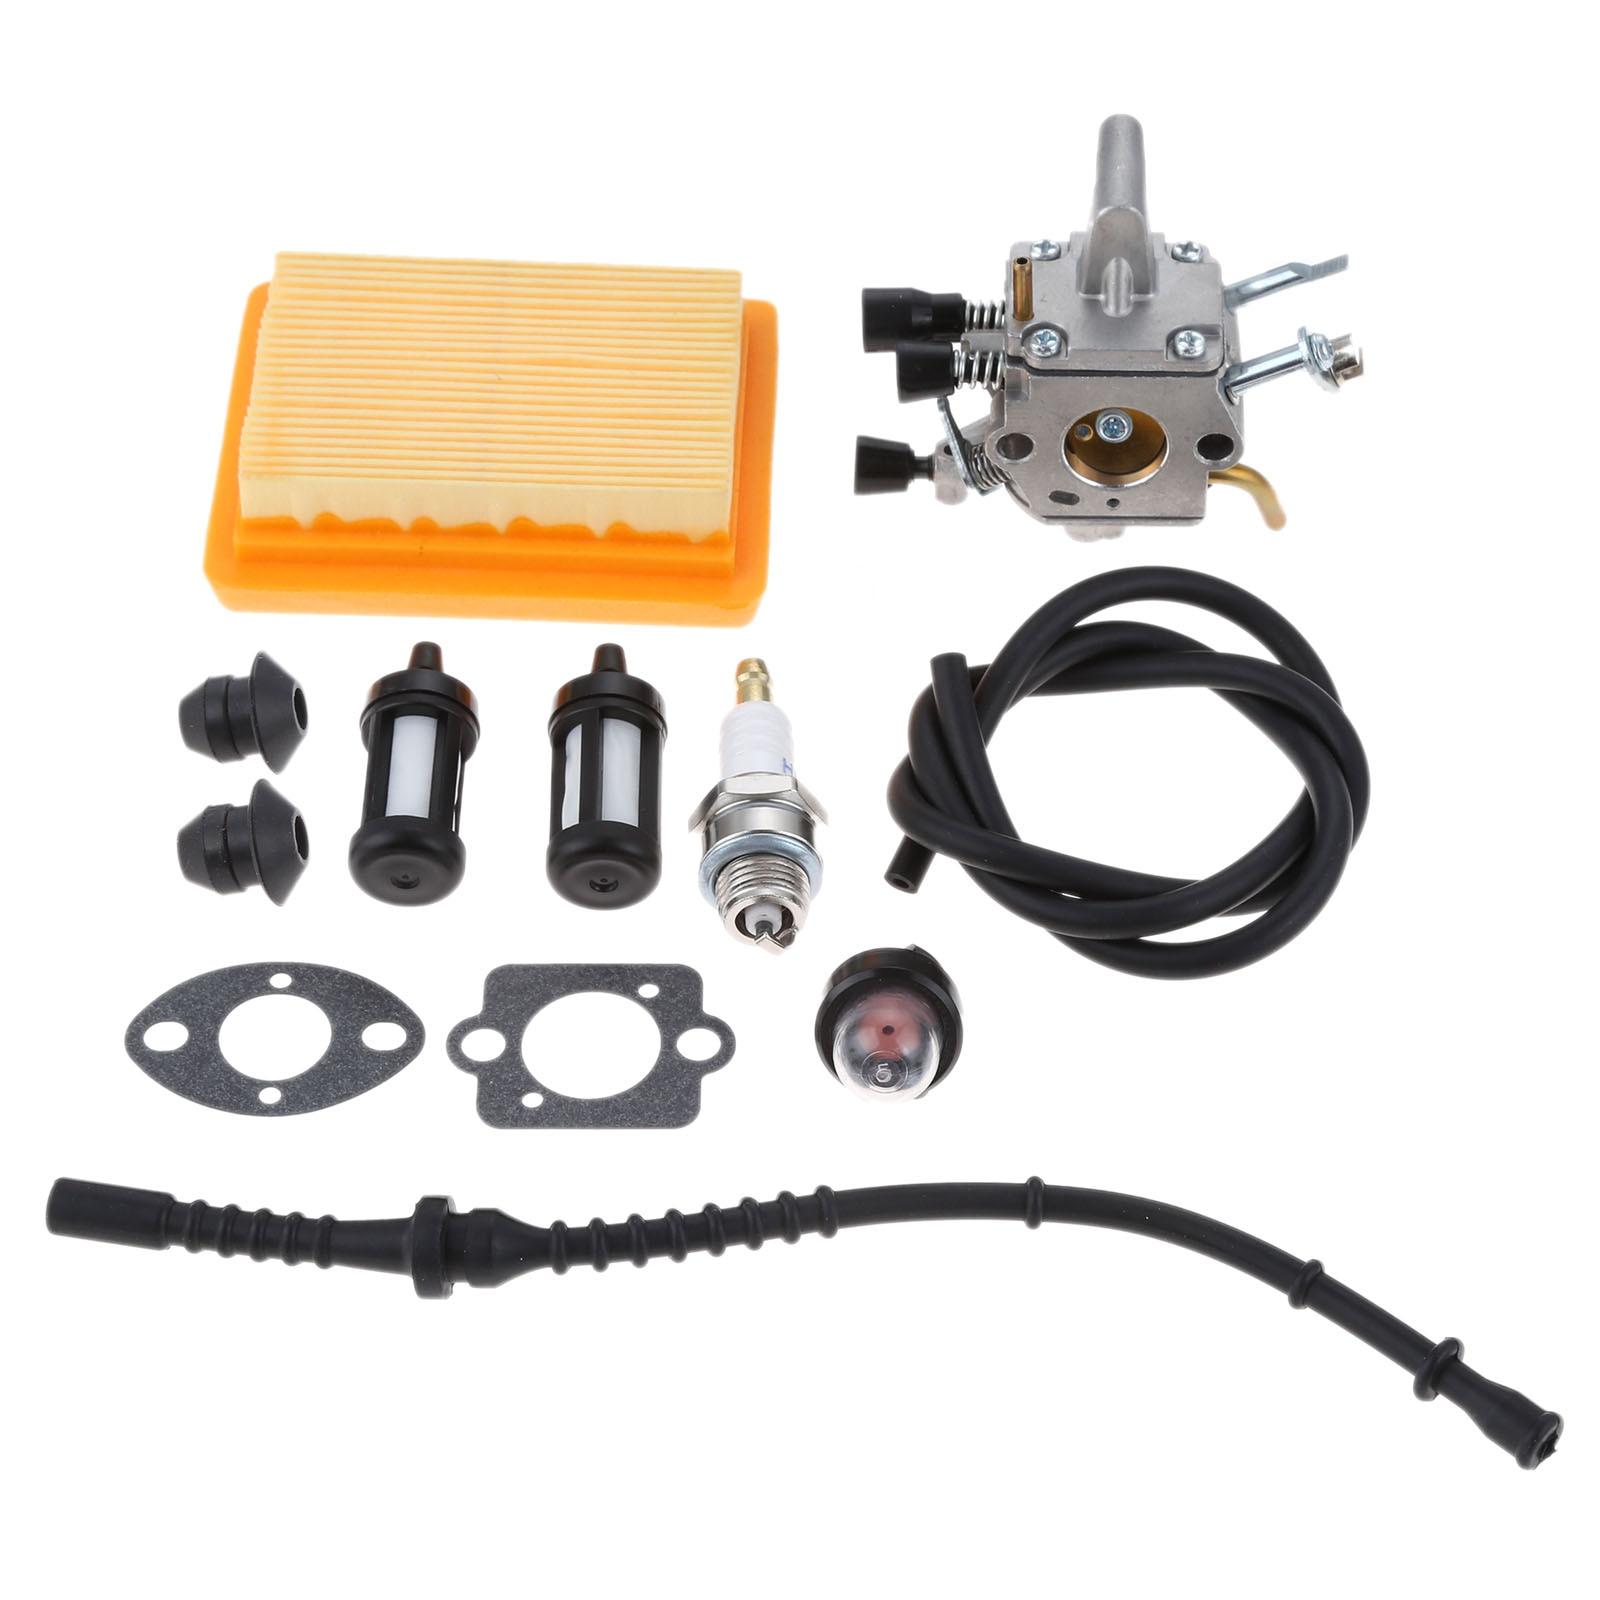 Carburador DRELD + filtro de aire Primer bombilla Kit de recarga de combustible apto para STIHL FS120 FS200 FS250 FS300 FS350 FR350 FR450 recortador de cuerdas